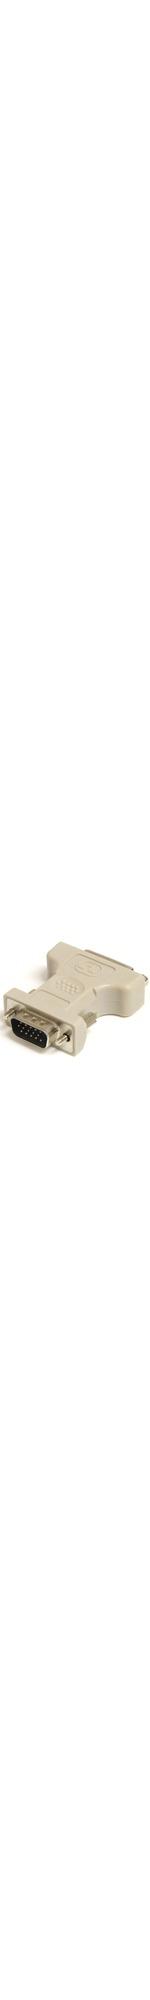 StarTech.com DVI to VGA Cable Adapter - F/M - 1 x DVI-I Female Video - 1 x HD-15 Male VGA - Beige